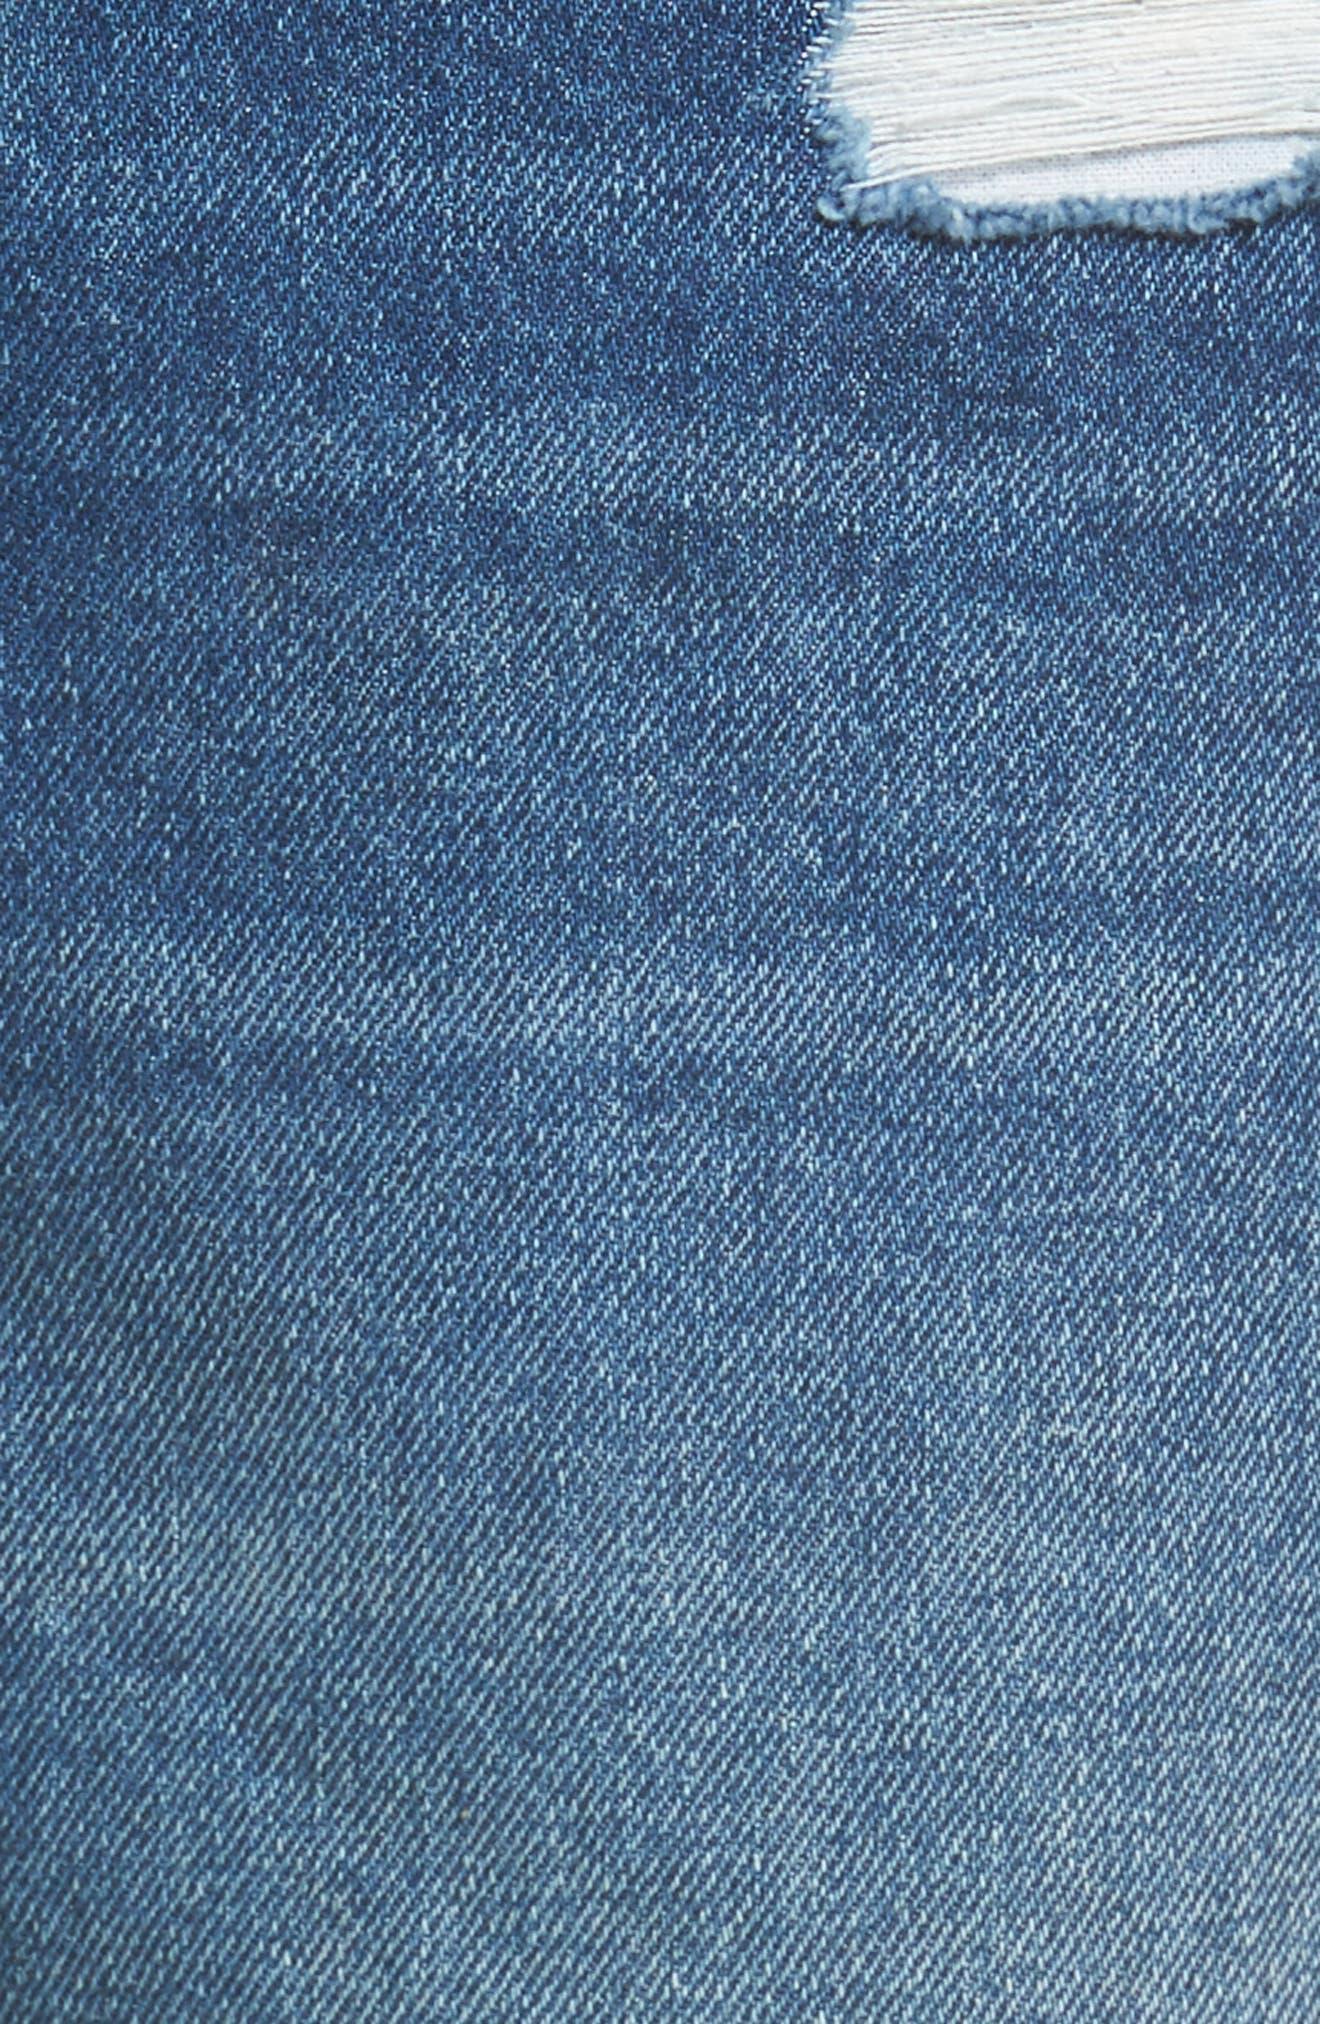 Embellished Straight Leg Jeans,                             Alternate thumbnail 5, color,